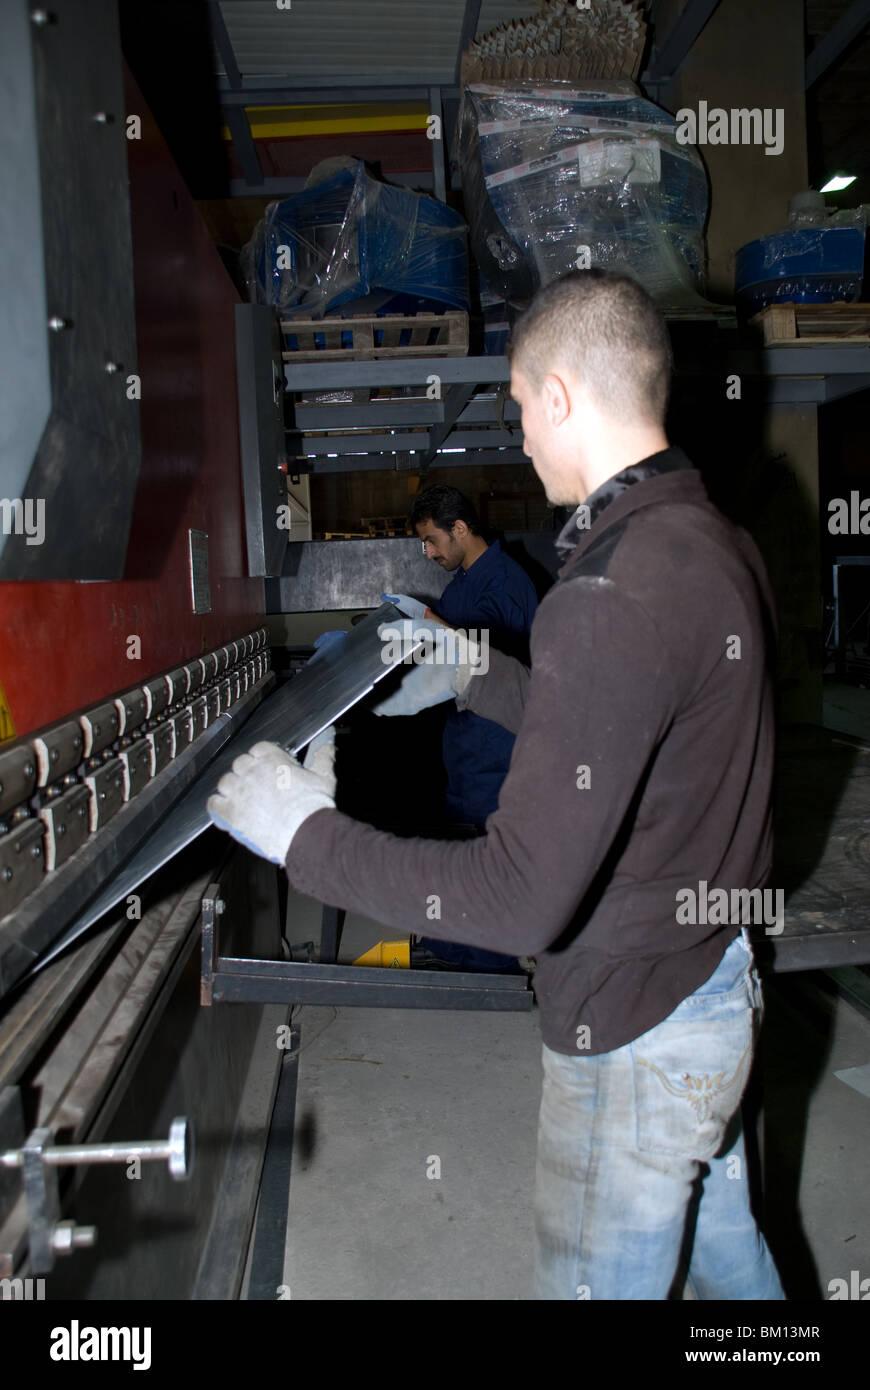 Kurdish and Irak worker binding in a steel factory lebanon - Stock Image